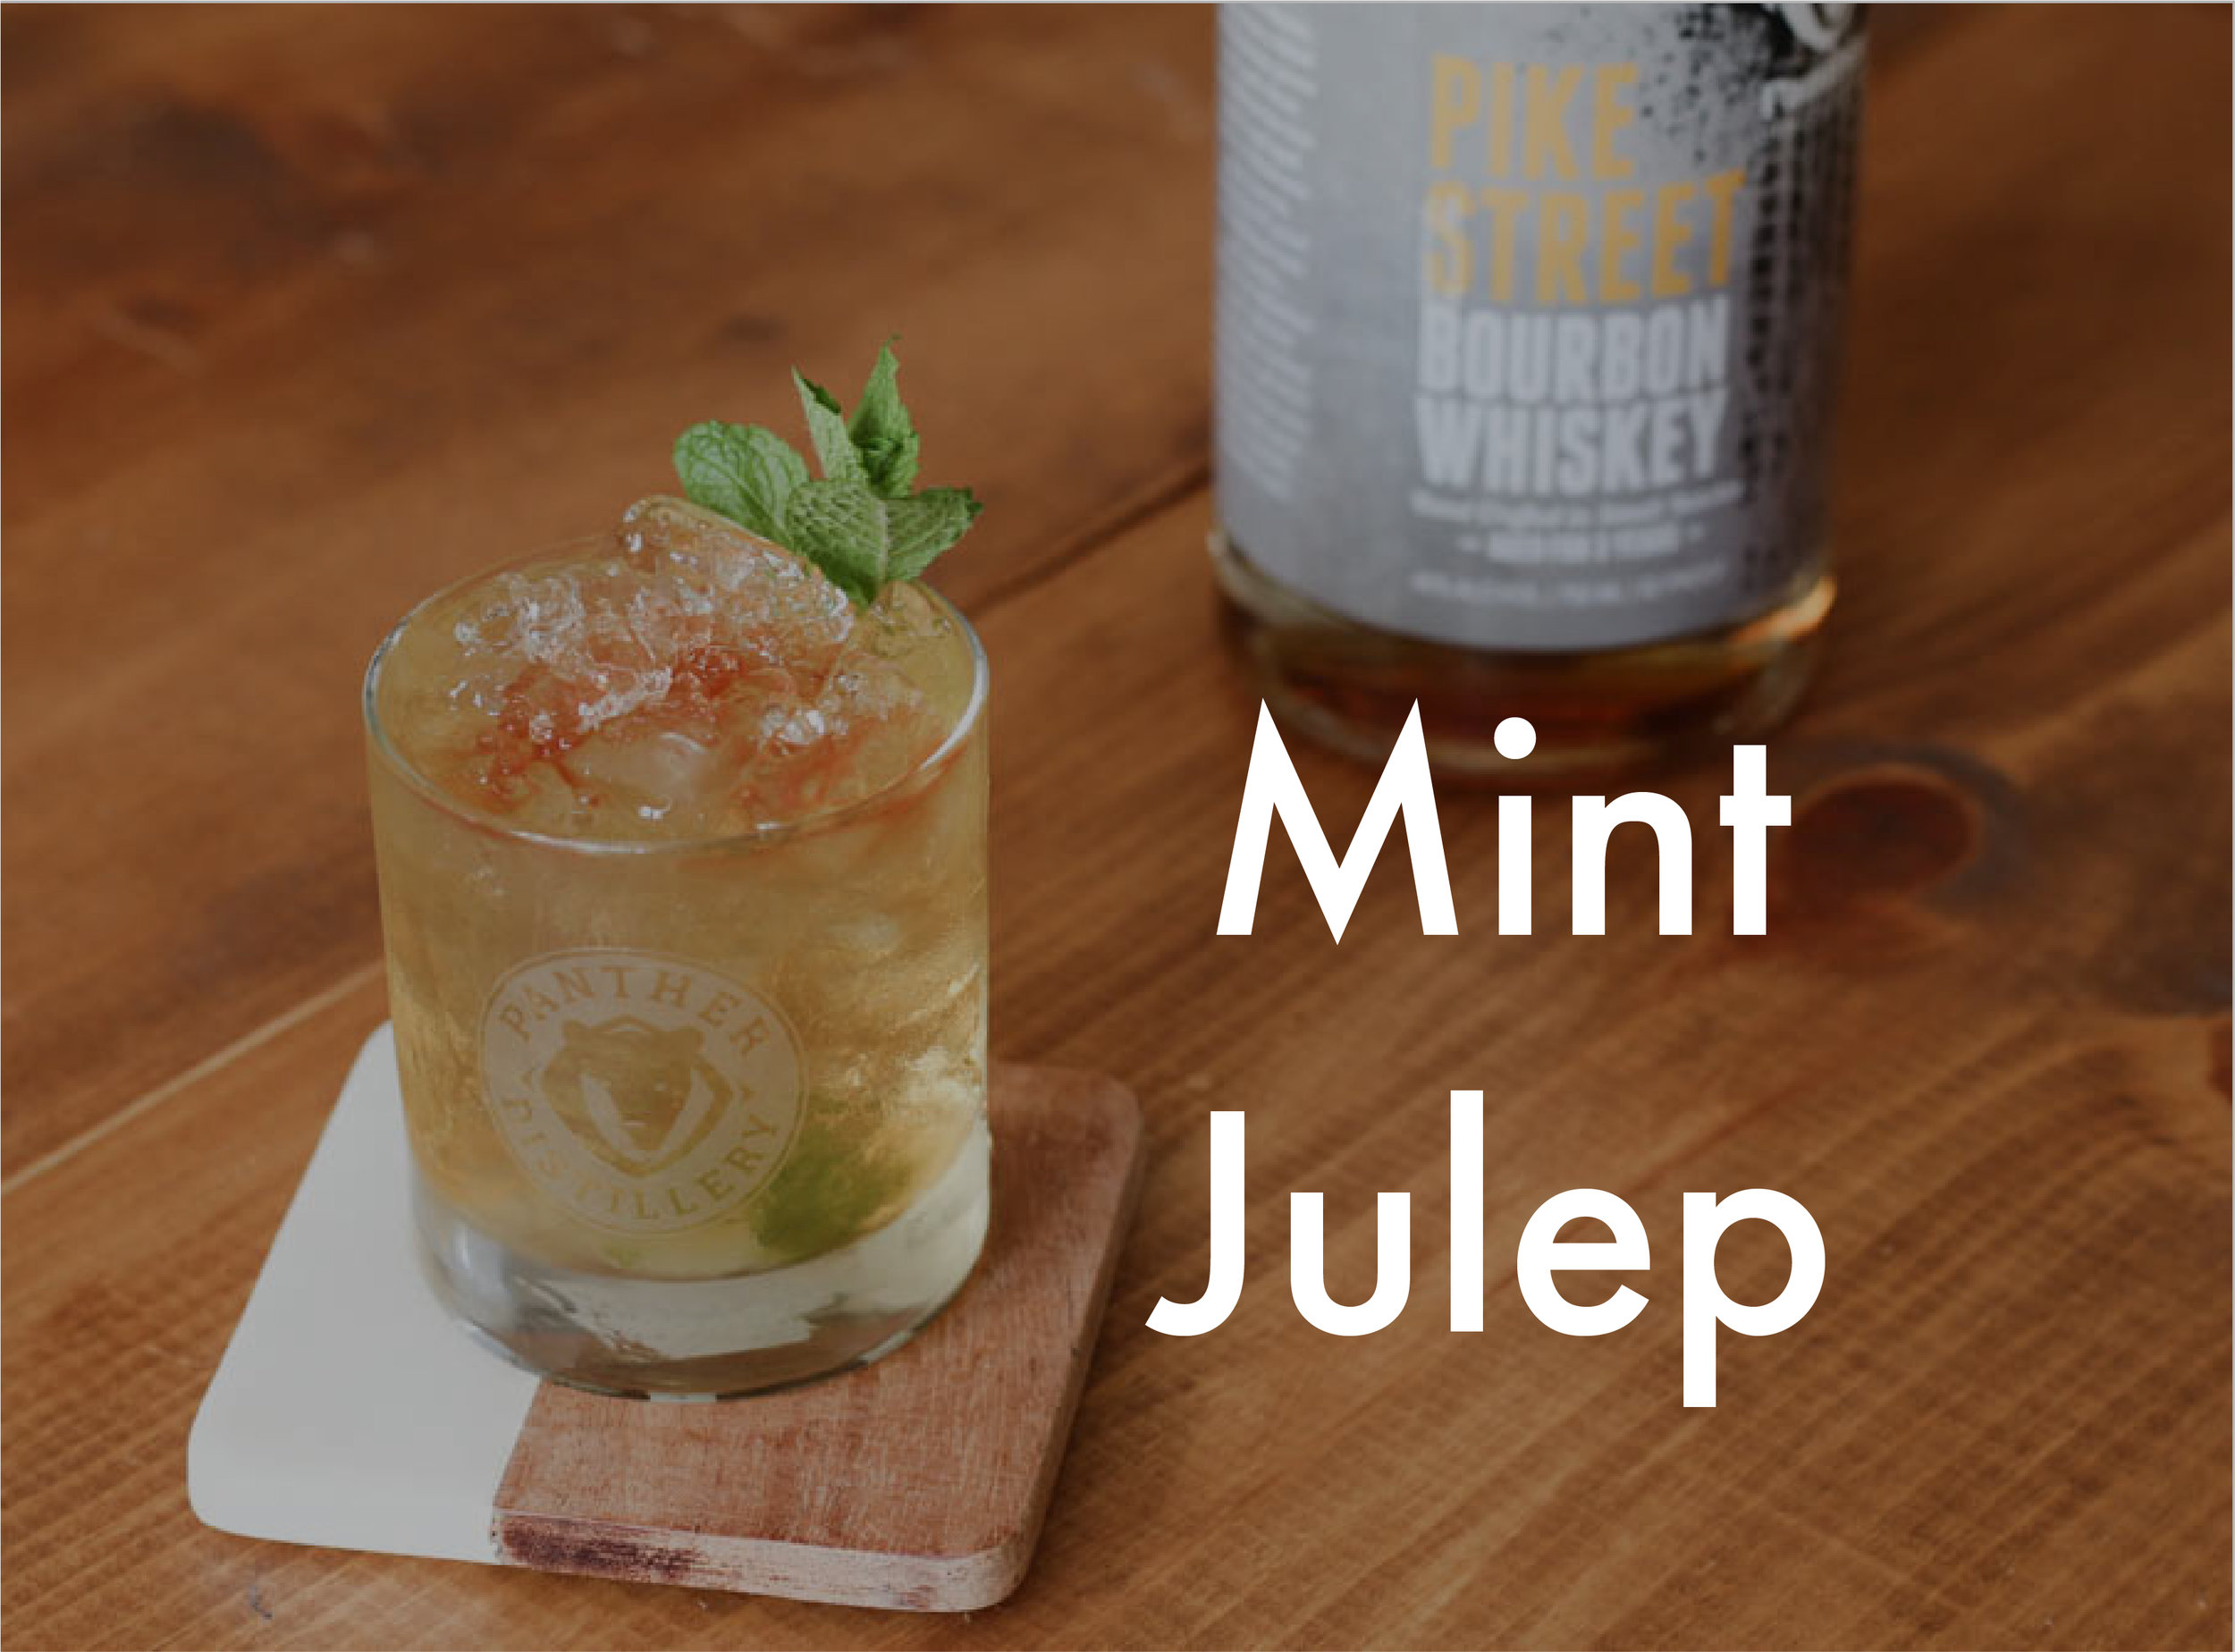 Mint Julep Panther Distillery